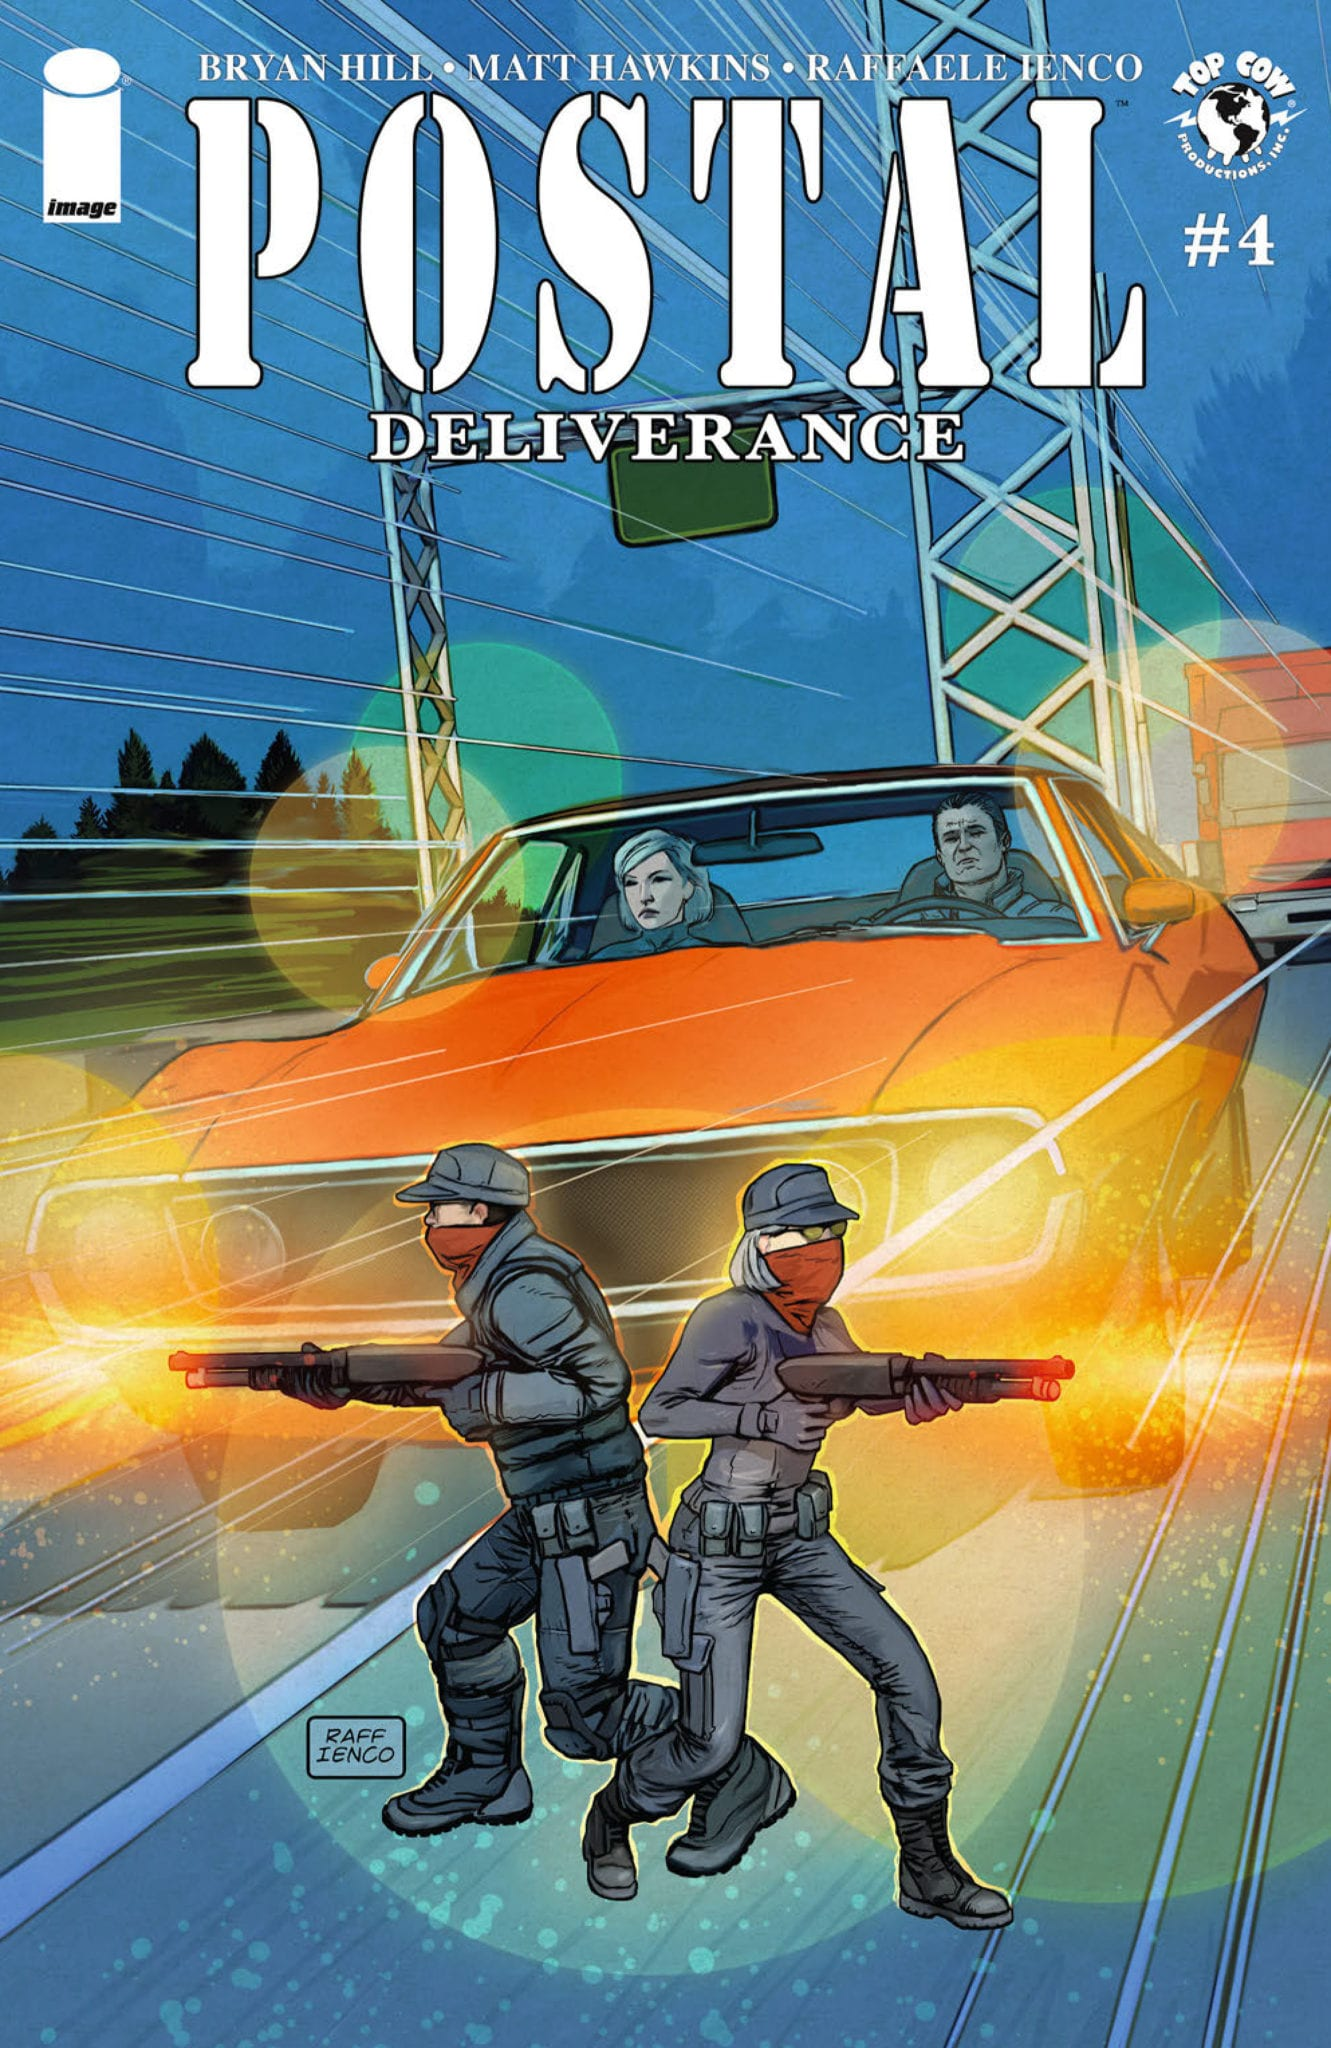 postal deliverance exclusive preview image comics top cow